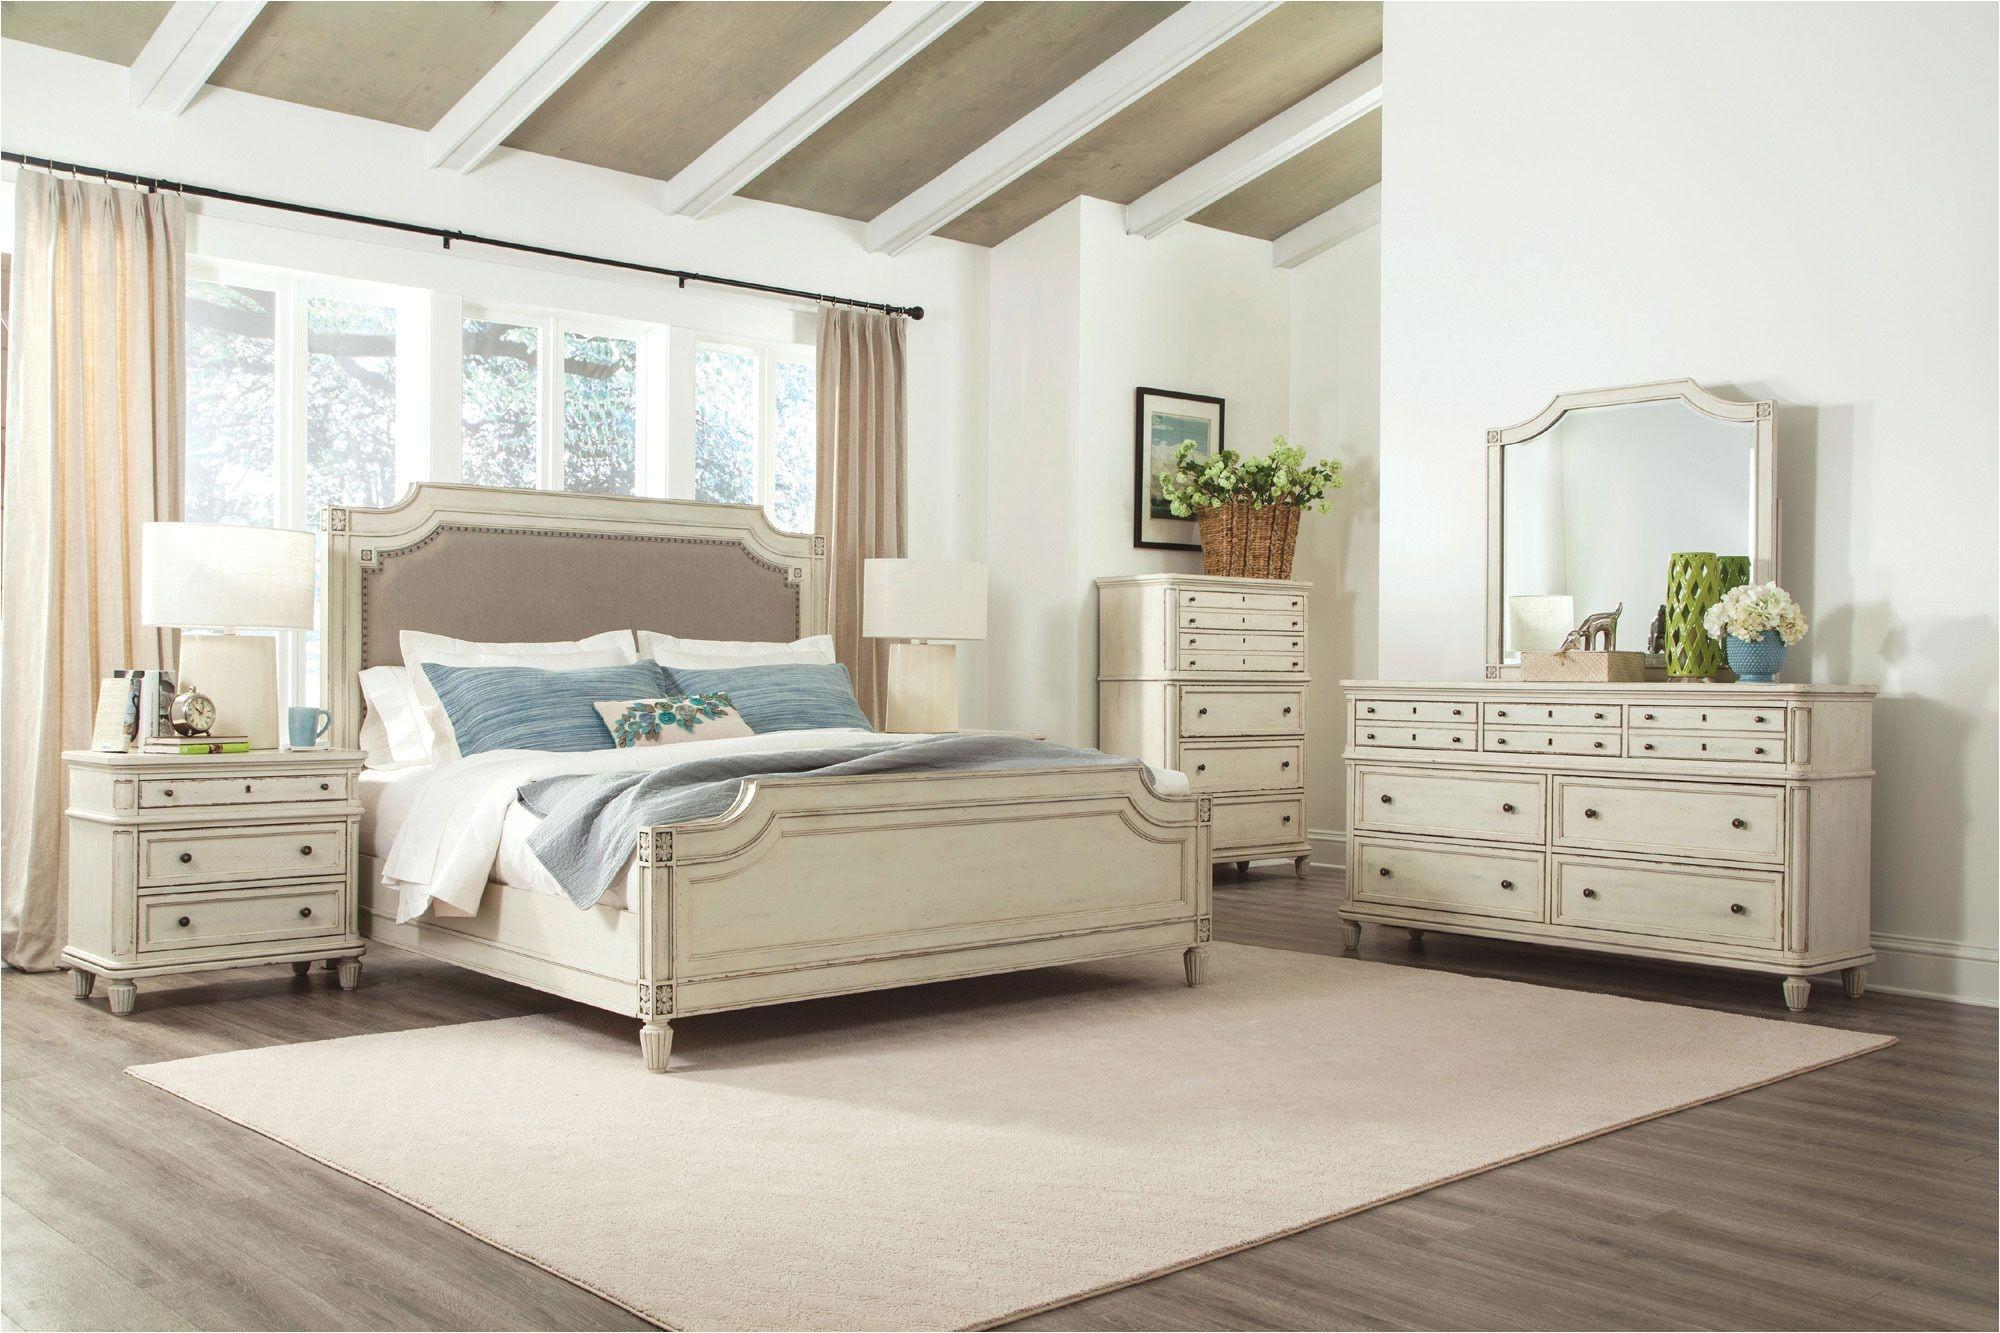 huntleigh upholstered bedroom set riverside home gallery stores